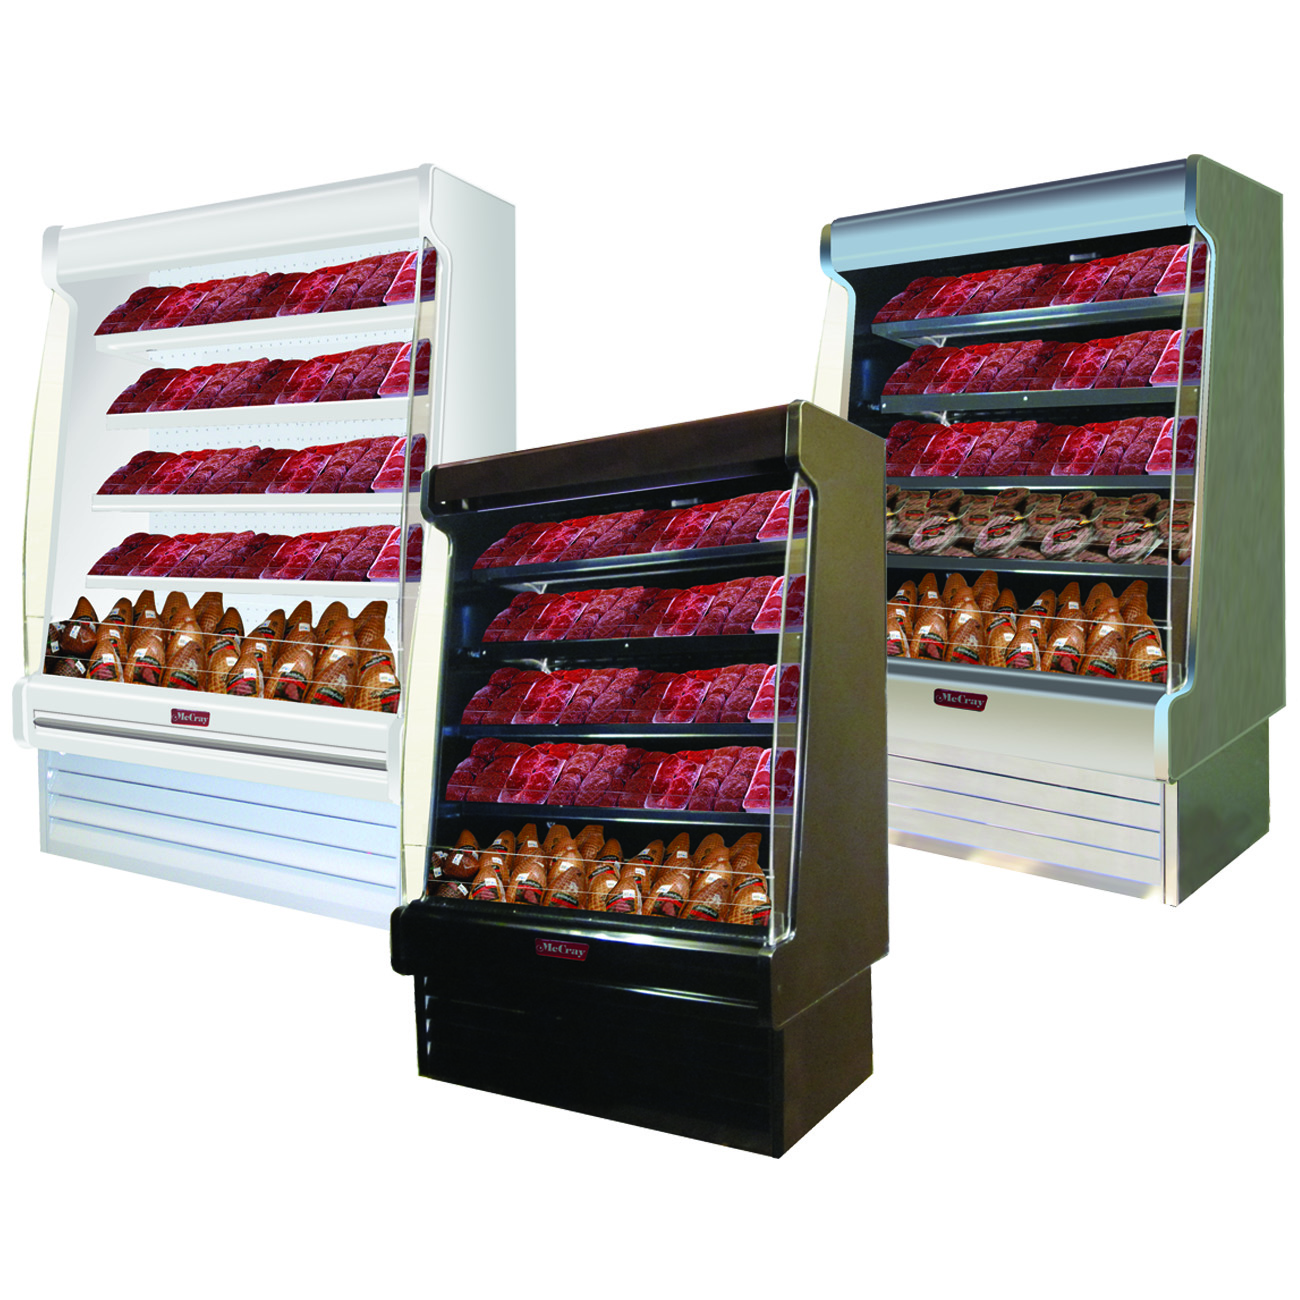 Howard-McCray SC-OM35E-4S-S-LED merchandiser, open refrigerated display